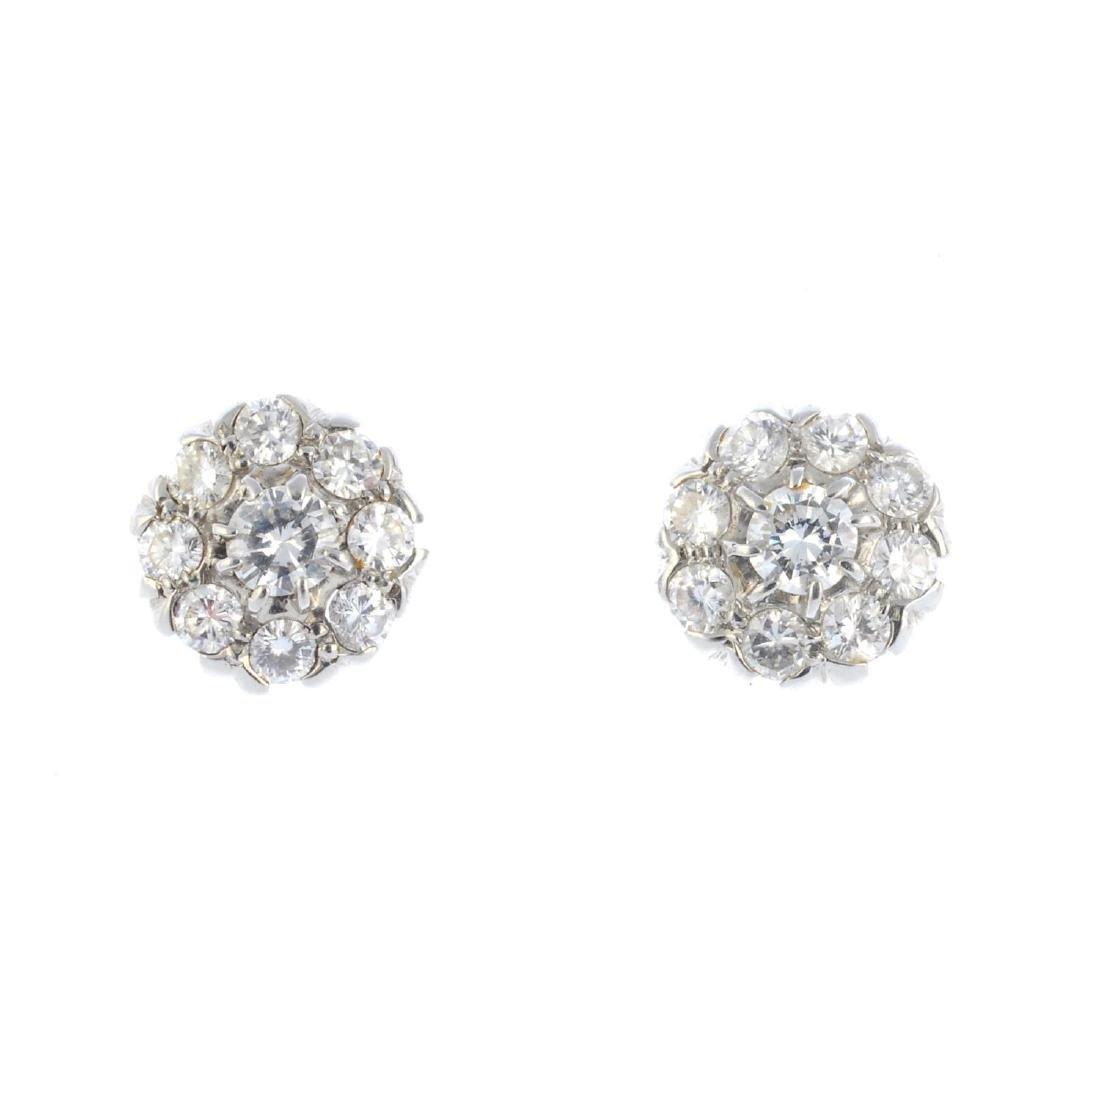 A pair of diamond cluster earrings. Each designed as